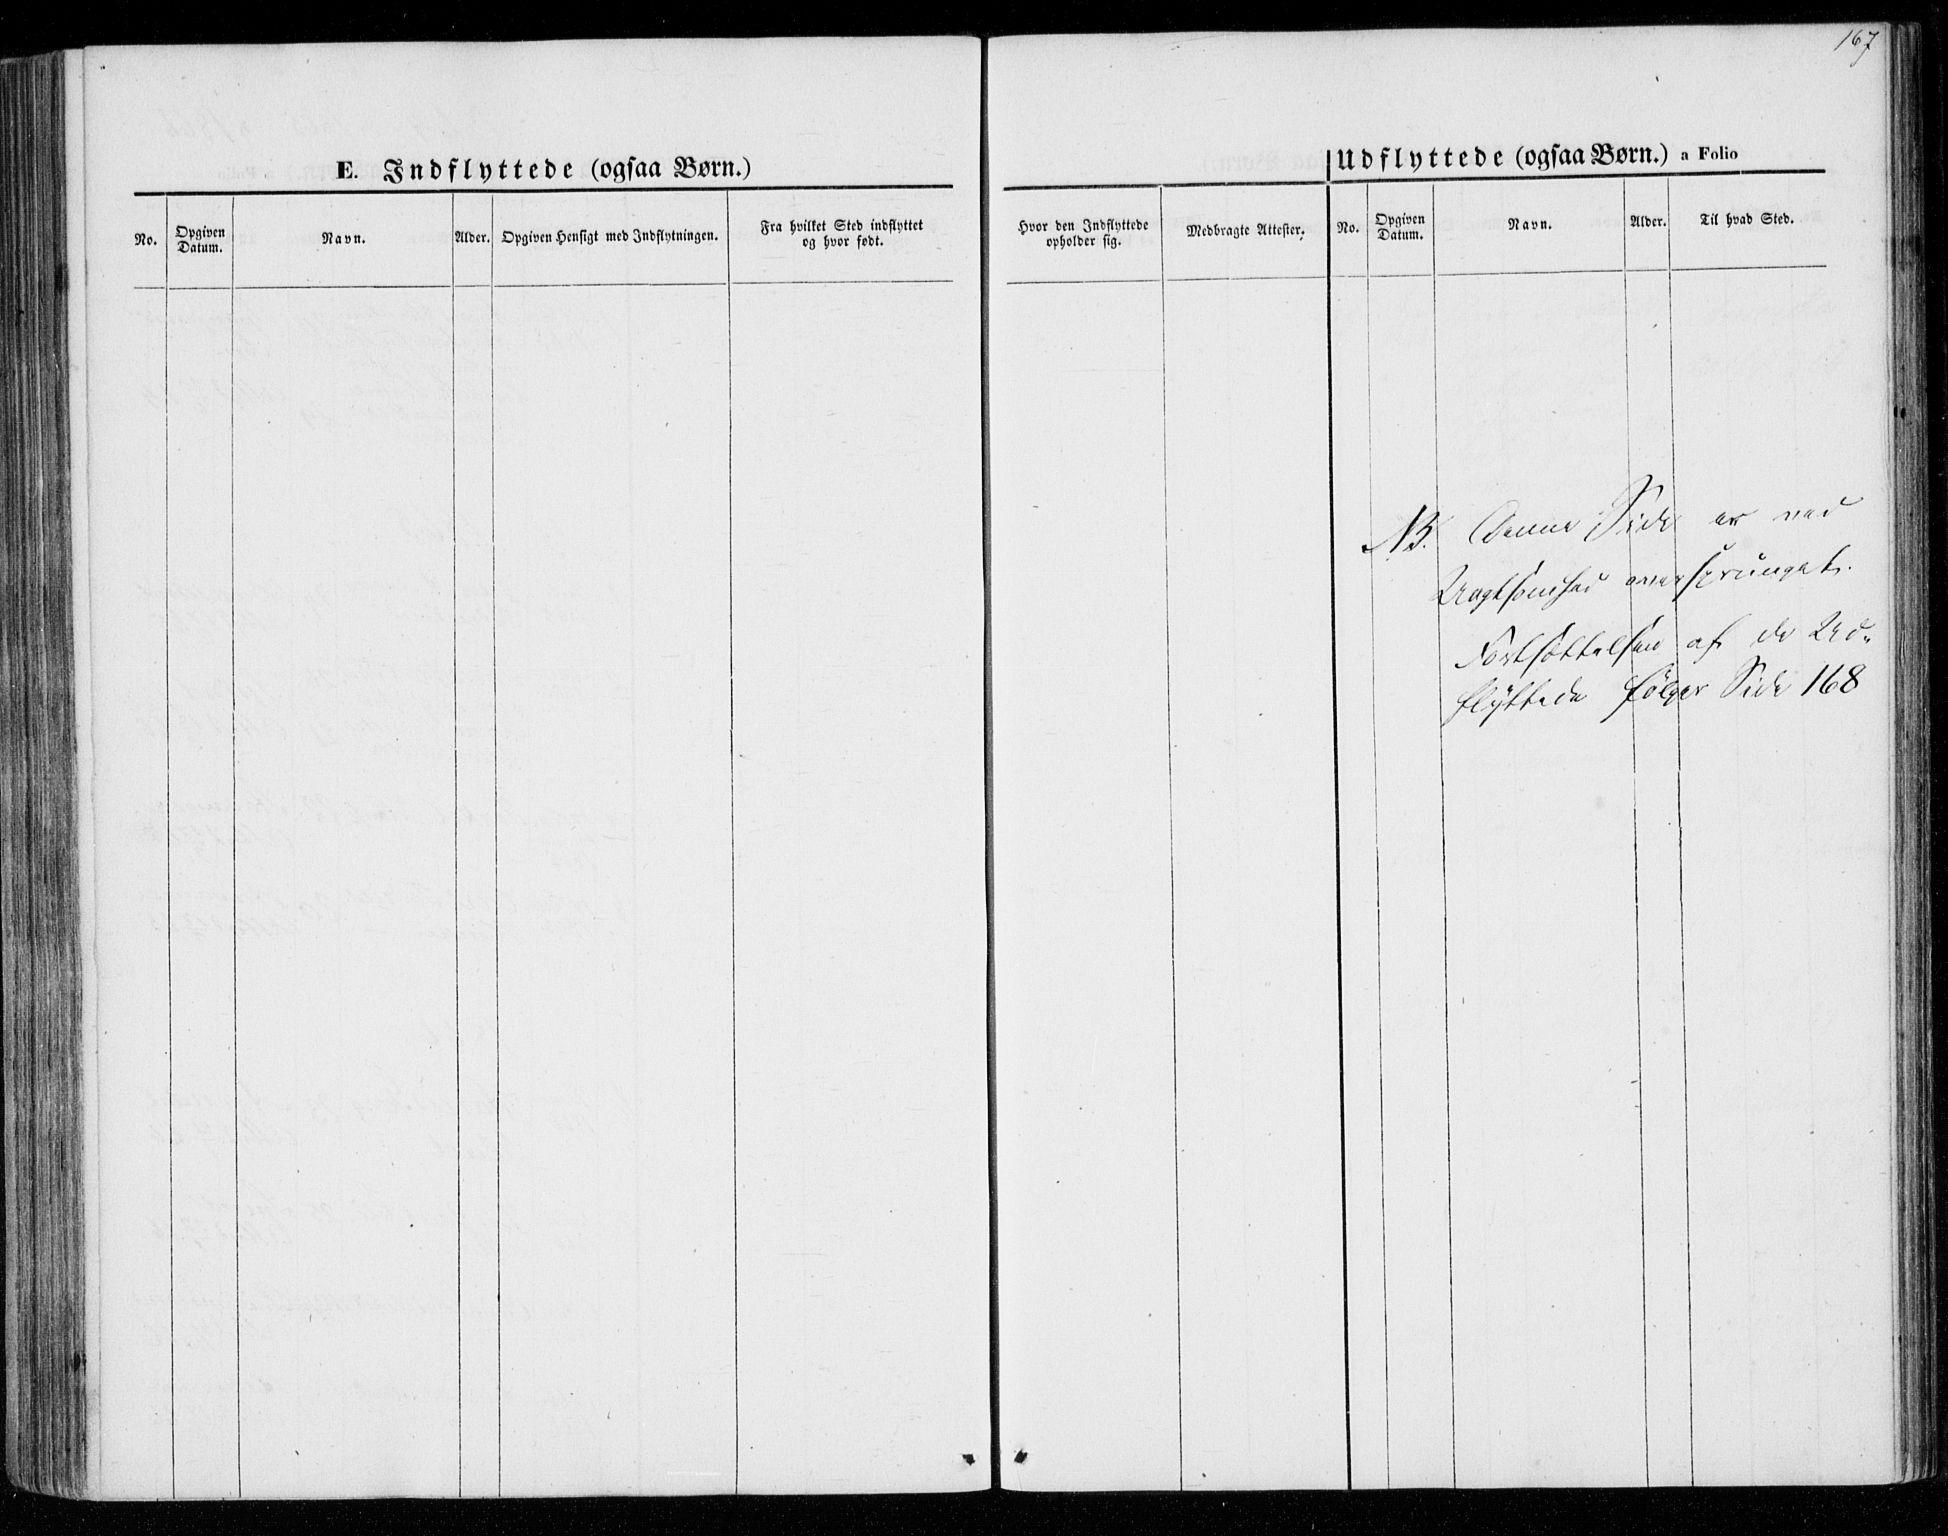 SAK, Lyngdal sokneprestkontor, F/Fa/Faa/L0002: Ministerialbok nr. A 2, 1858-1870, s. 167